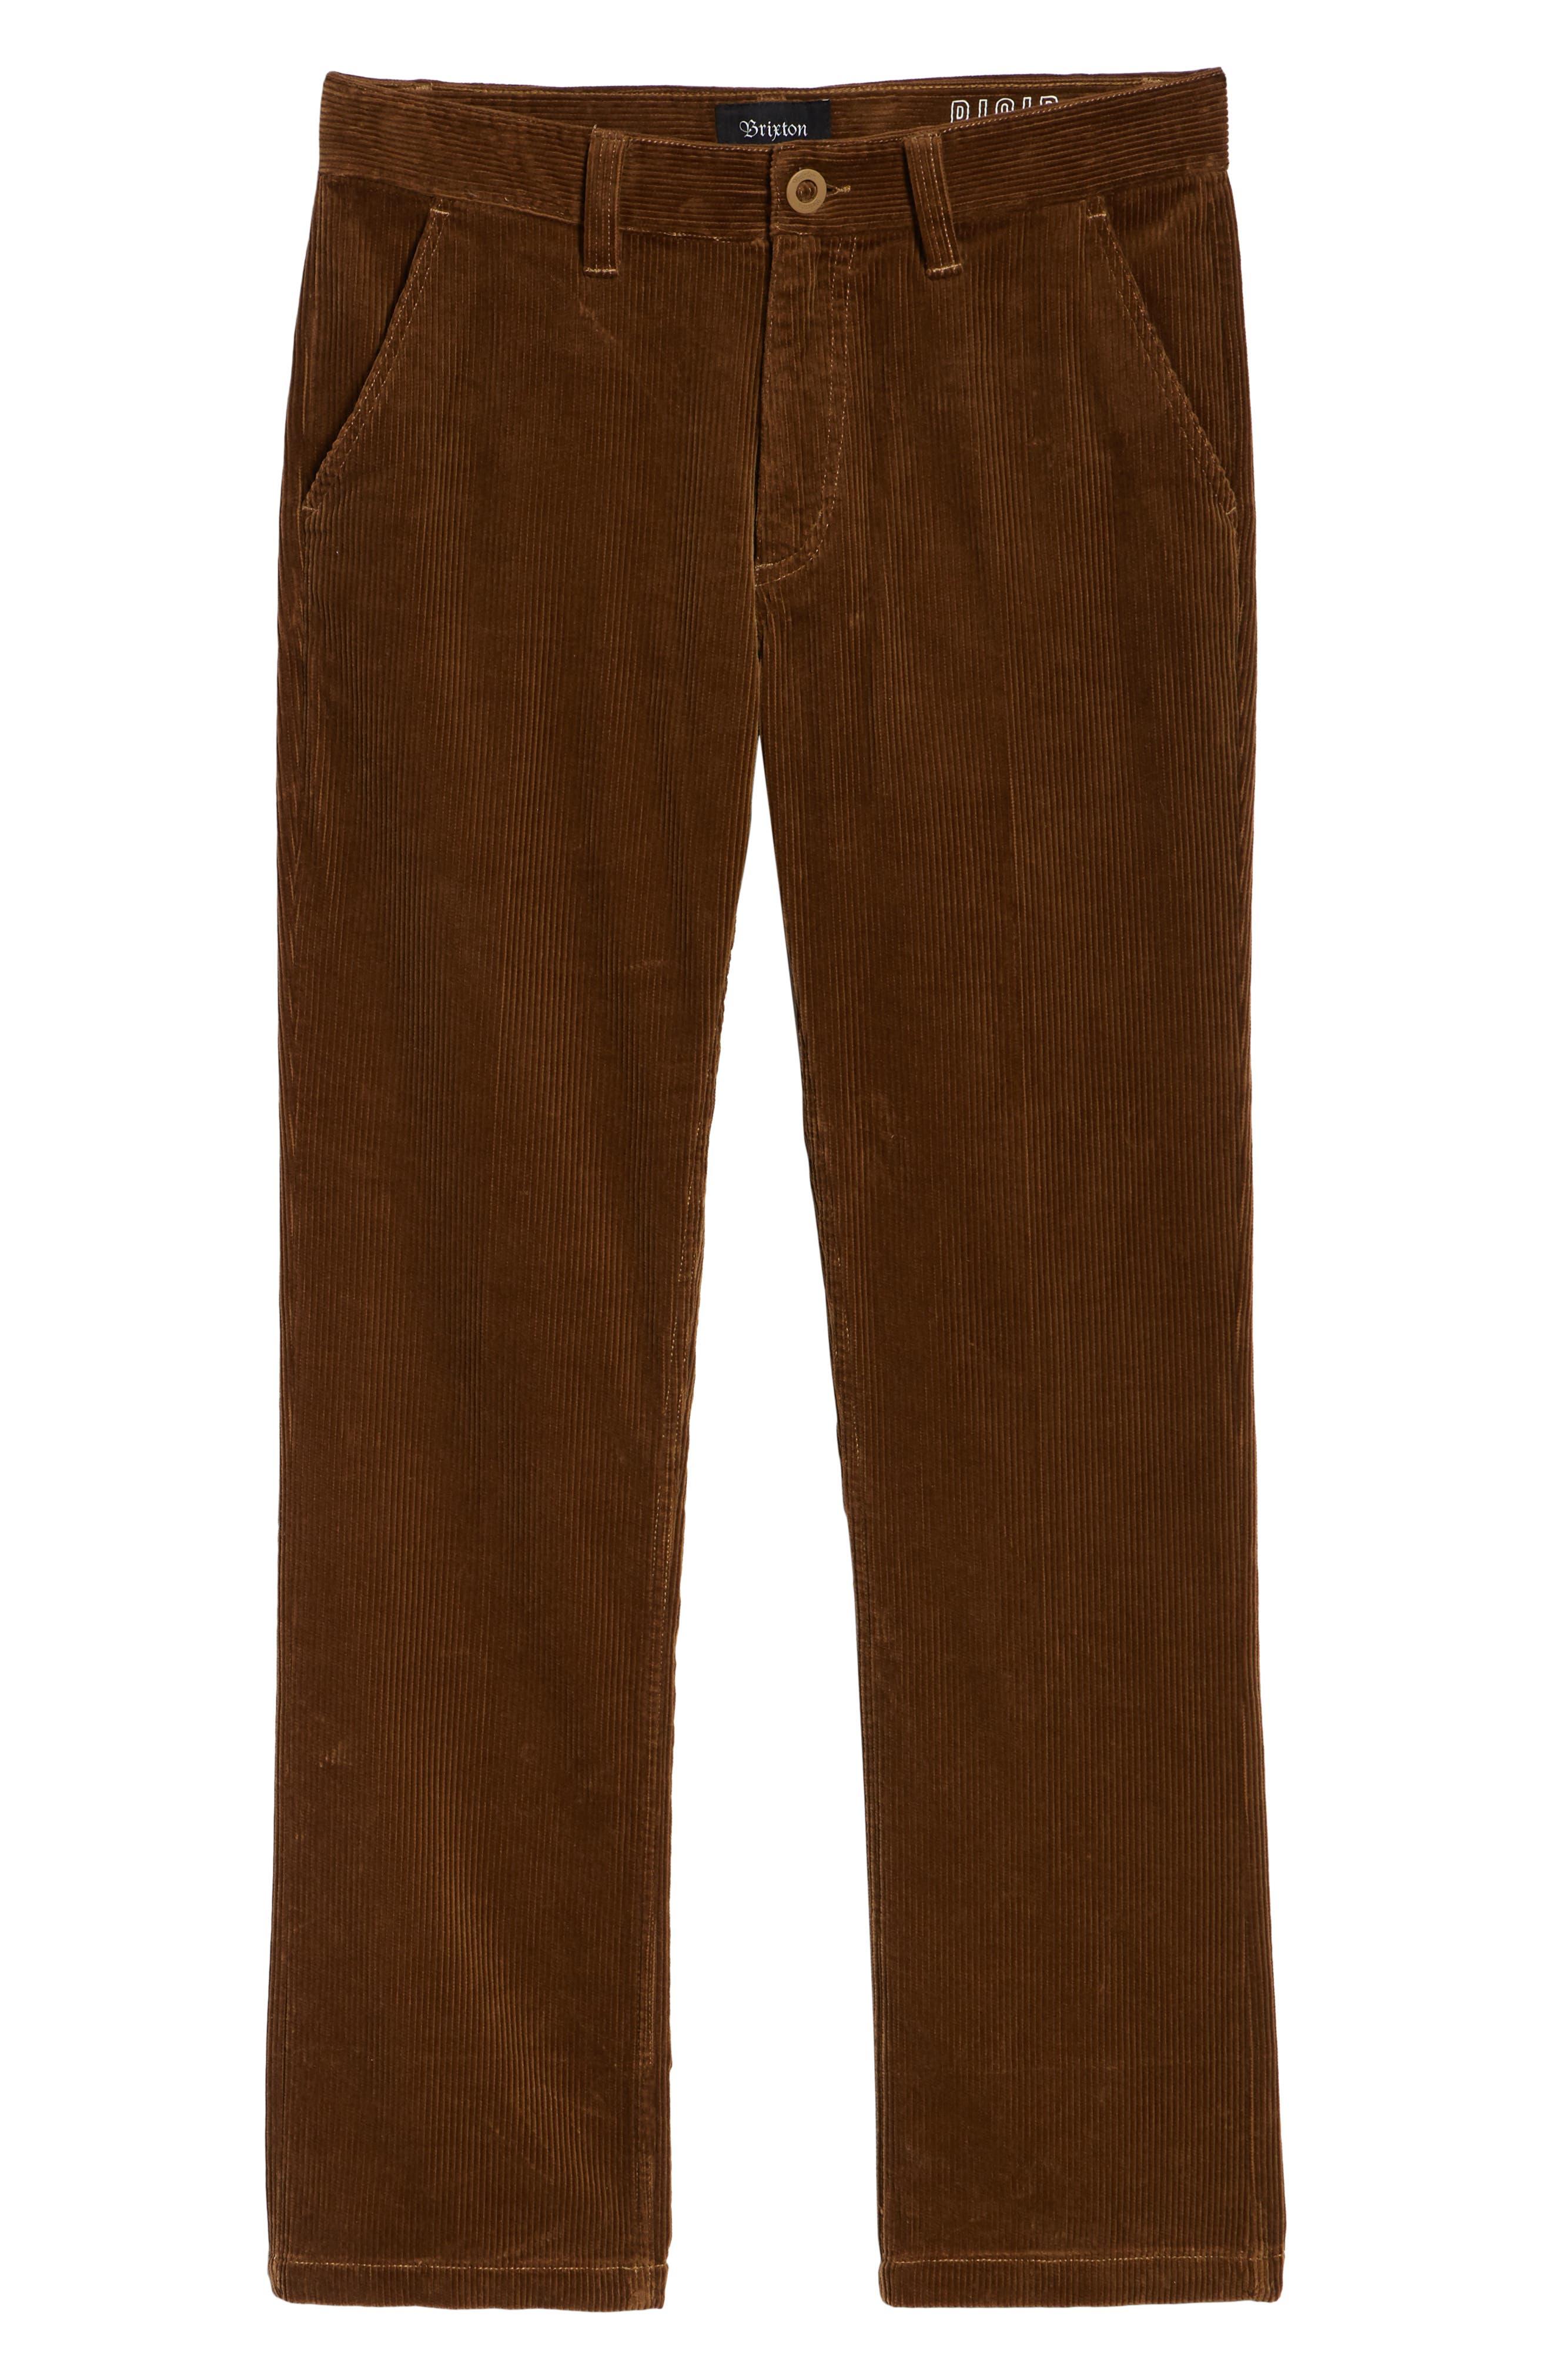 Fleet Rigid Chino Corduroy Pants,                             Alternate thumbnail 6, color,                             SIERRA